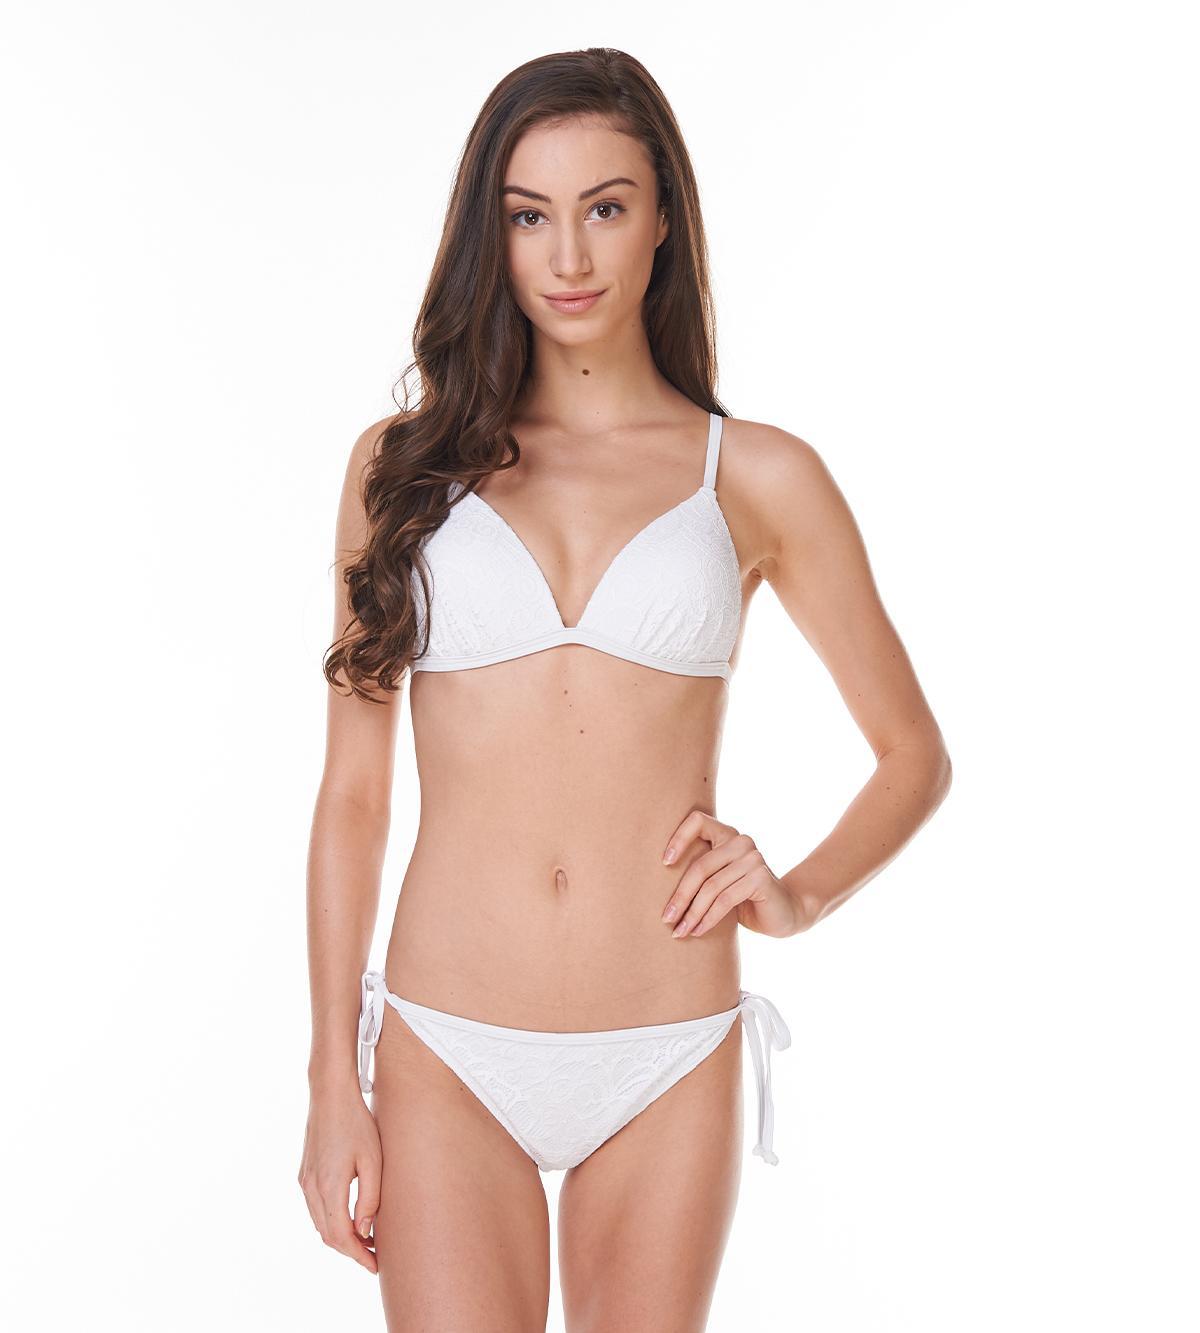 a84e2c5dd Minimal Coverage Sunbath Micro Bikini Teardrop Mini G-String 2Piece ...